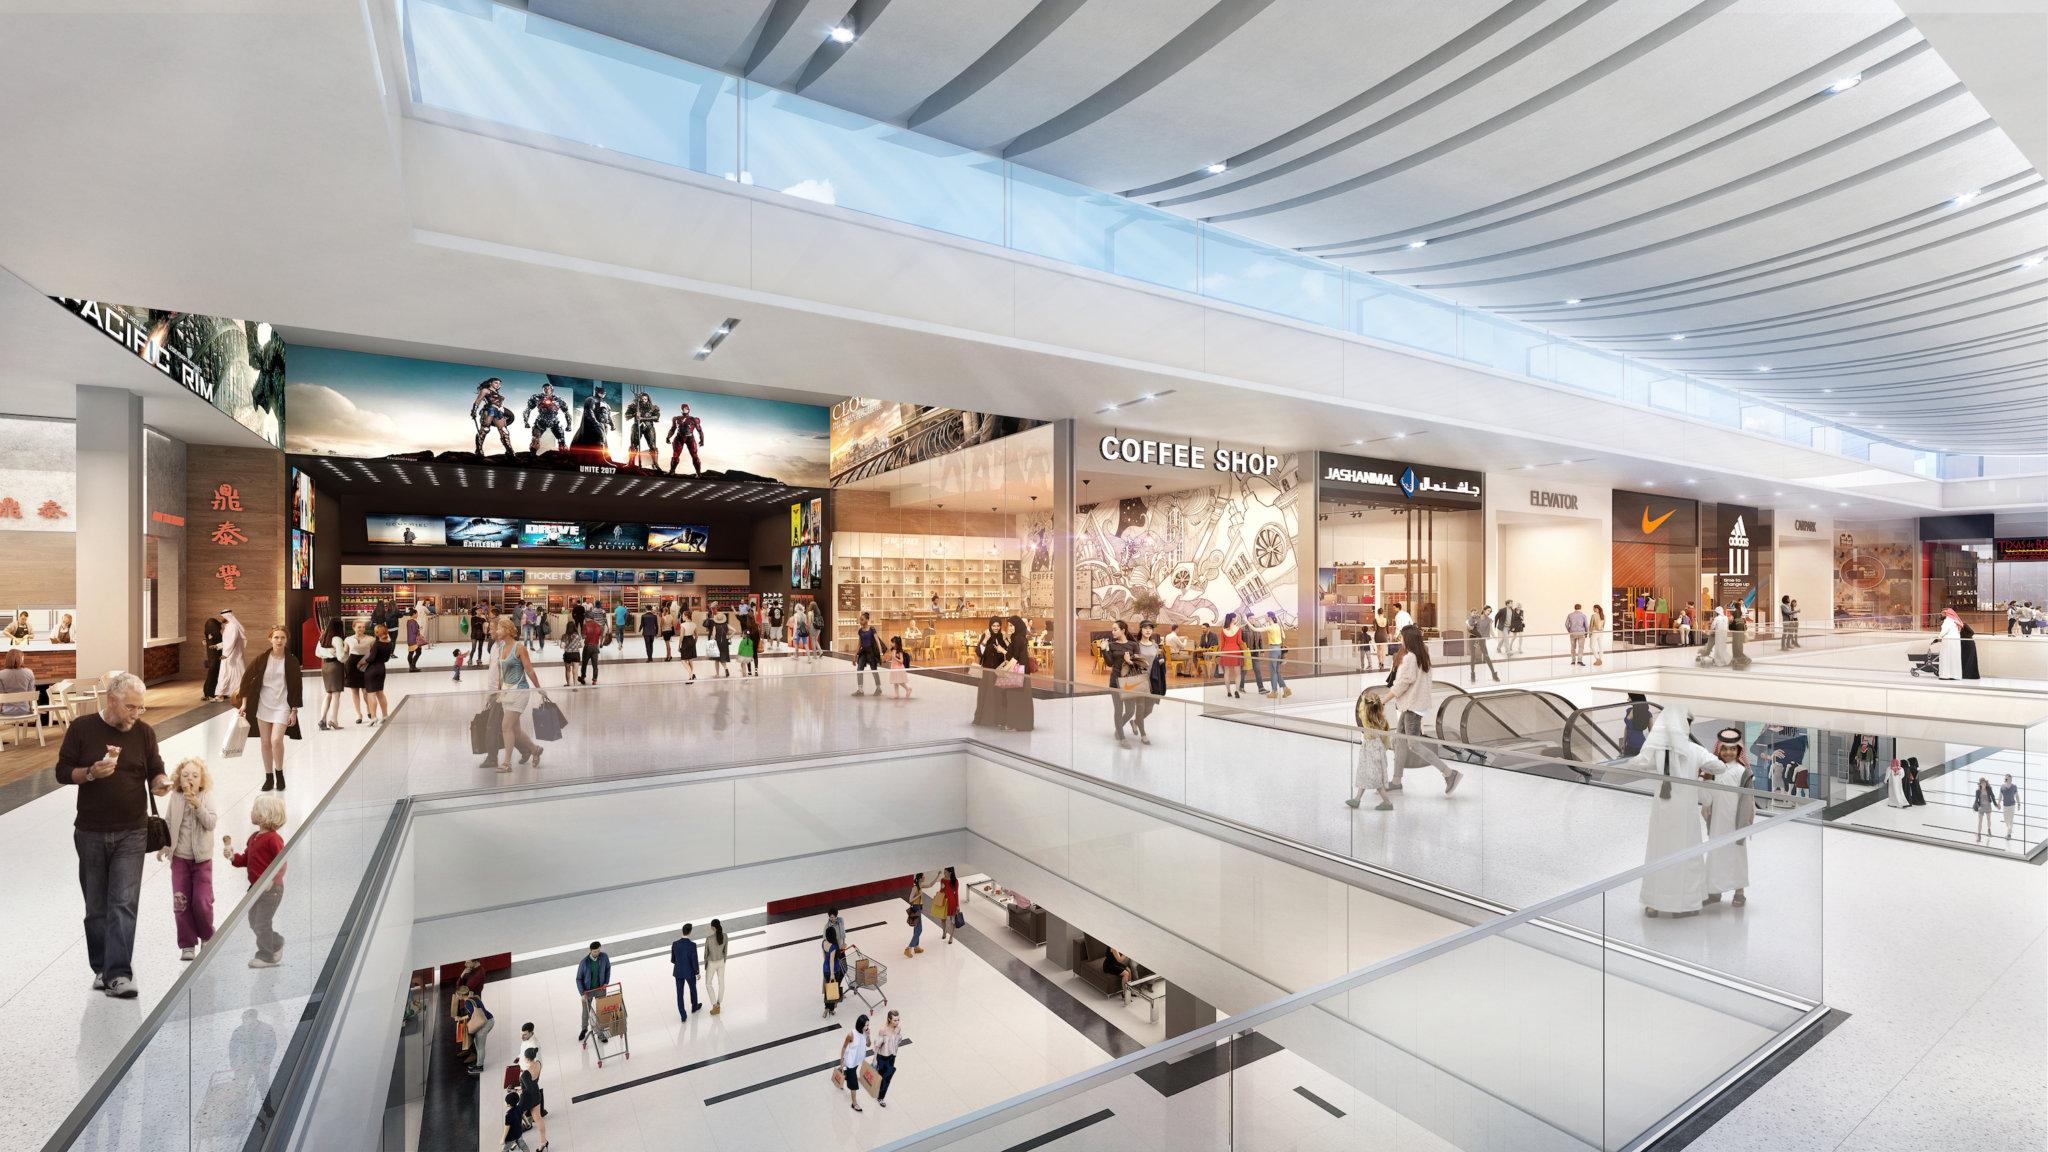 The Big Box Retail Mall - Wasl Gate1